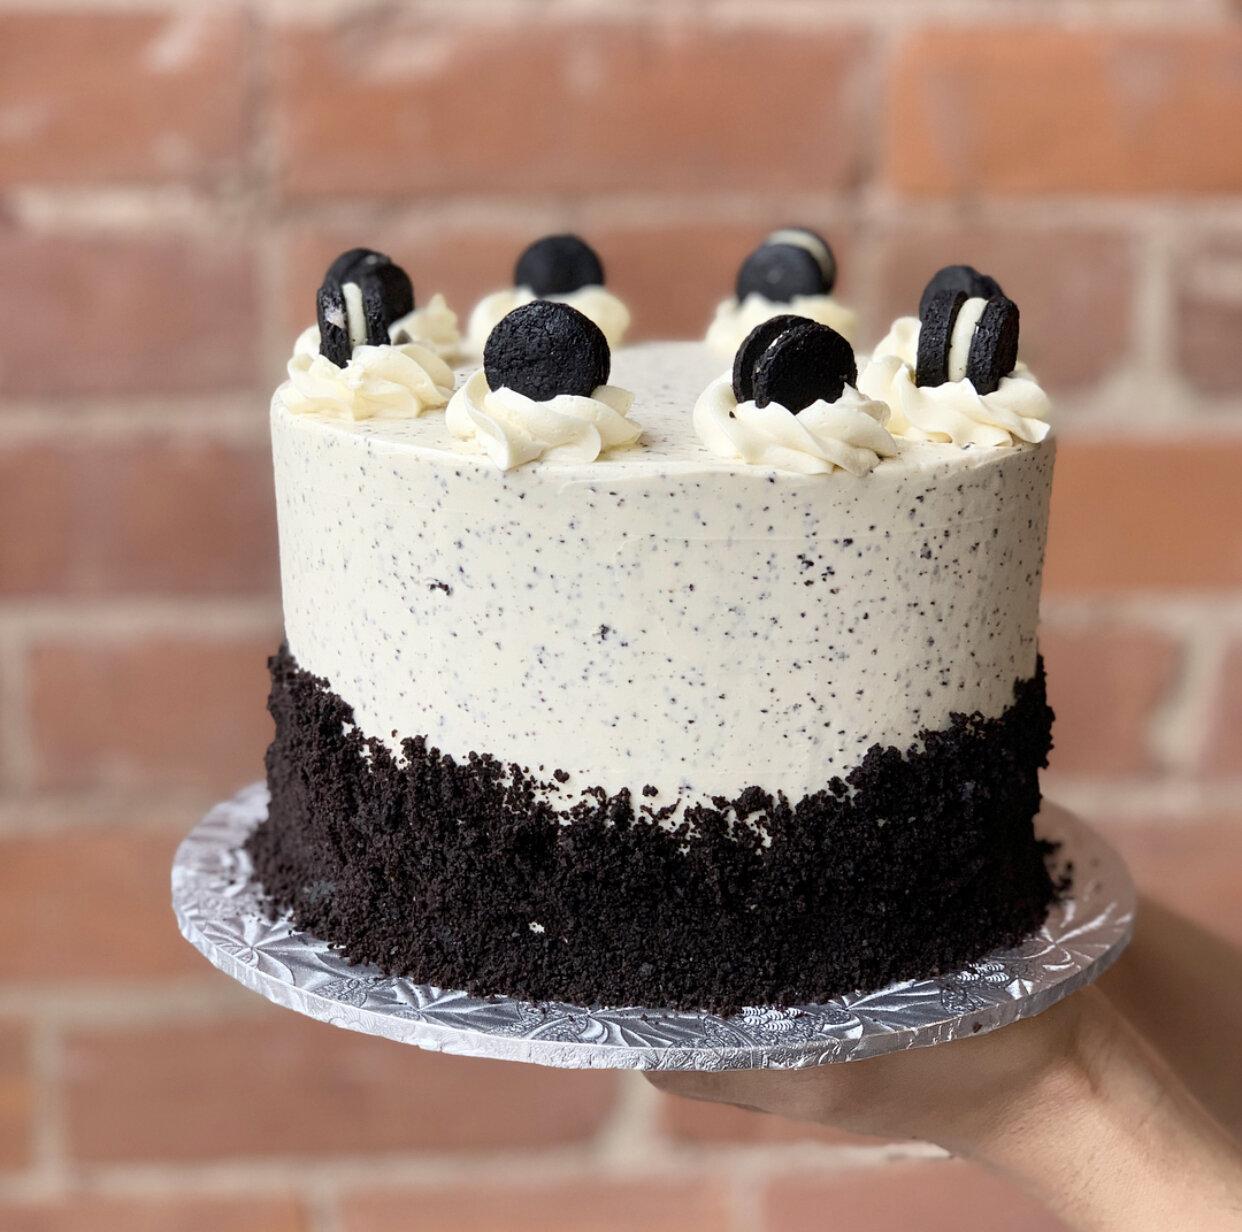 COOKIES N' CREAM CAKE (GF/K/P)  *Approx. 4g NC per standard size slice